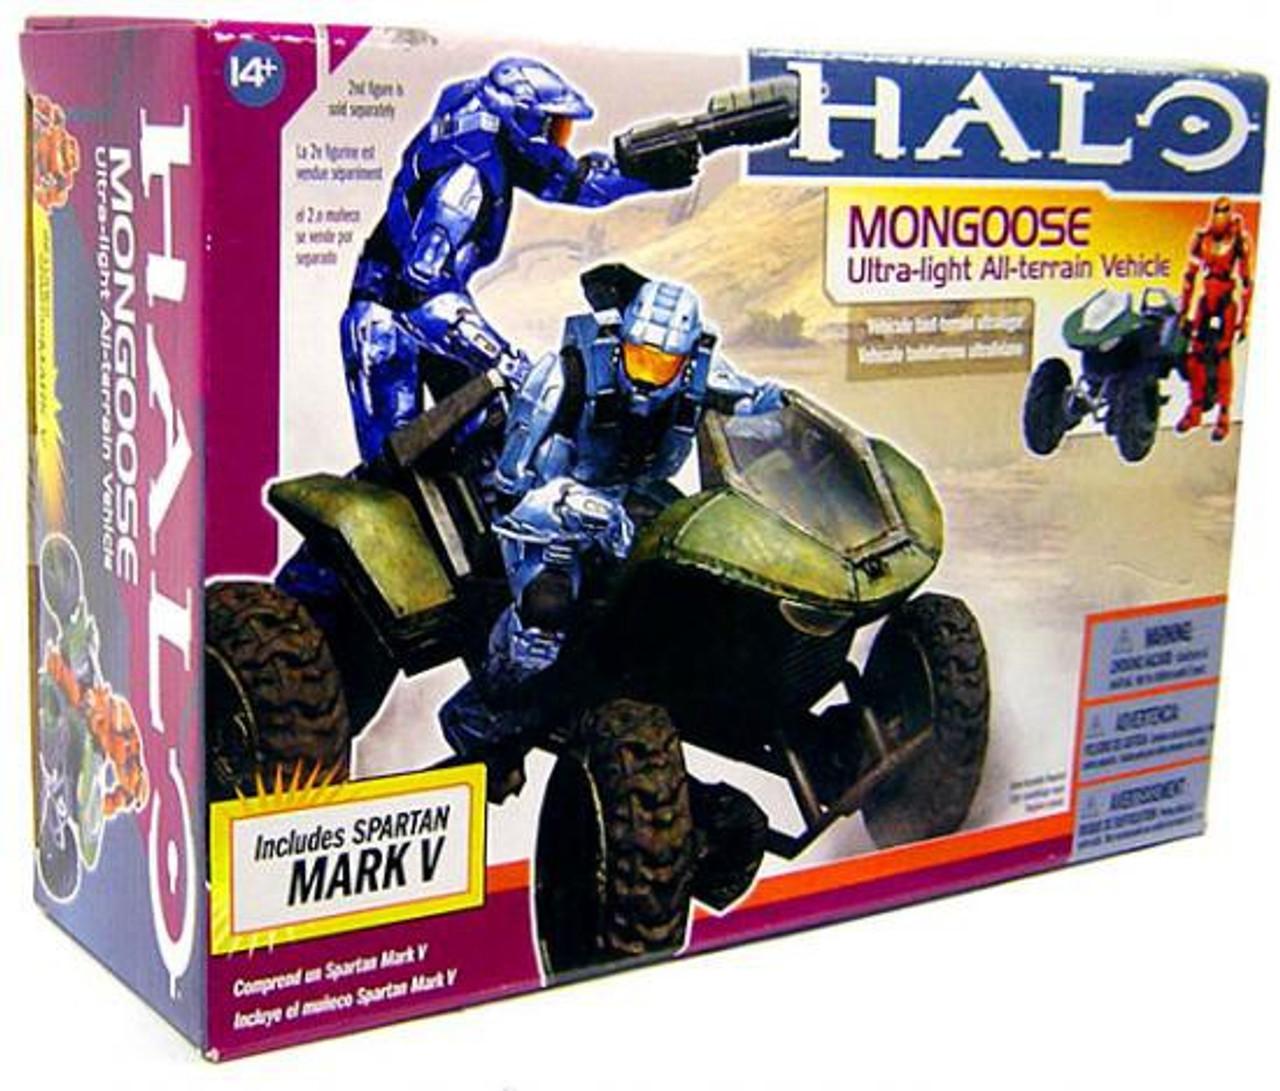 McFarlane Toys Halo Deluxe Mongoose Action Figure Vehicle [Spartan Mark V]